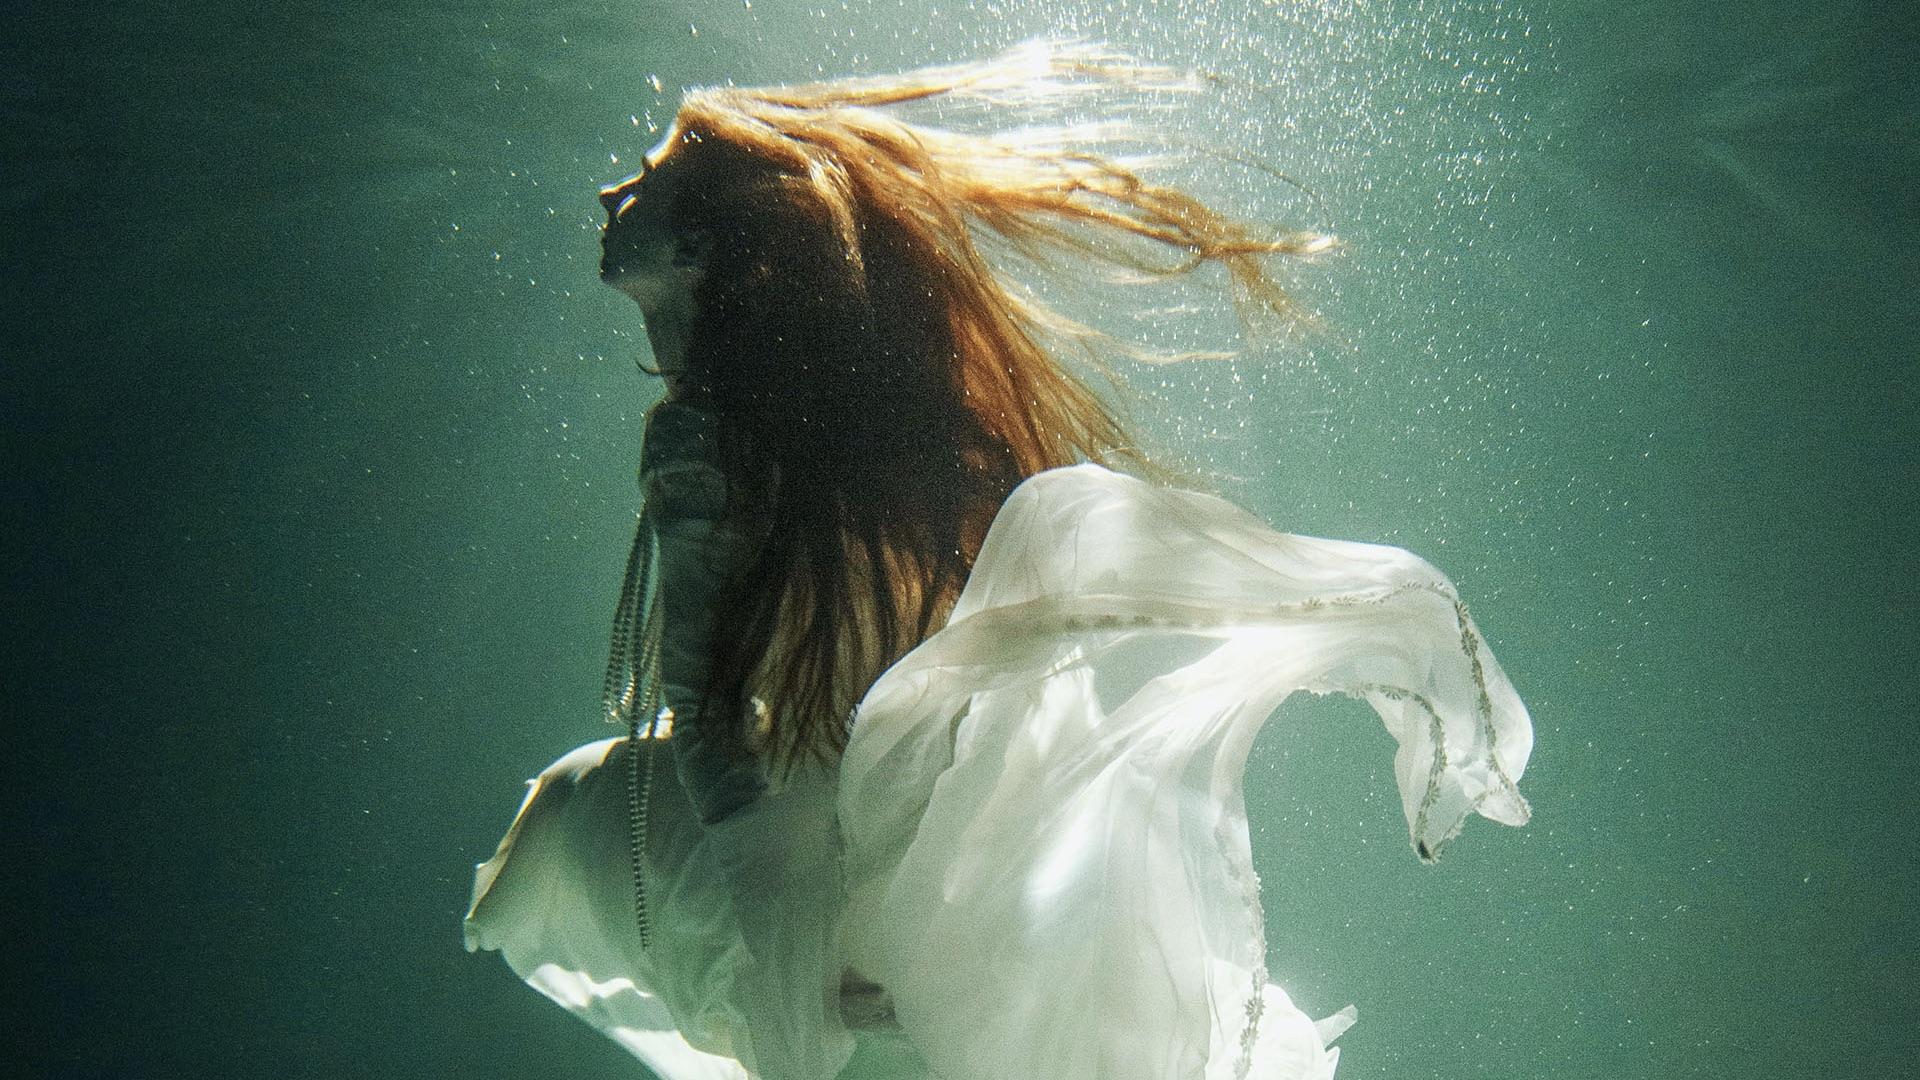 Licensing Contributor Marie Dashkova on creating romantic, conceptual photos